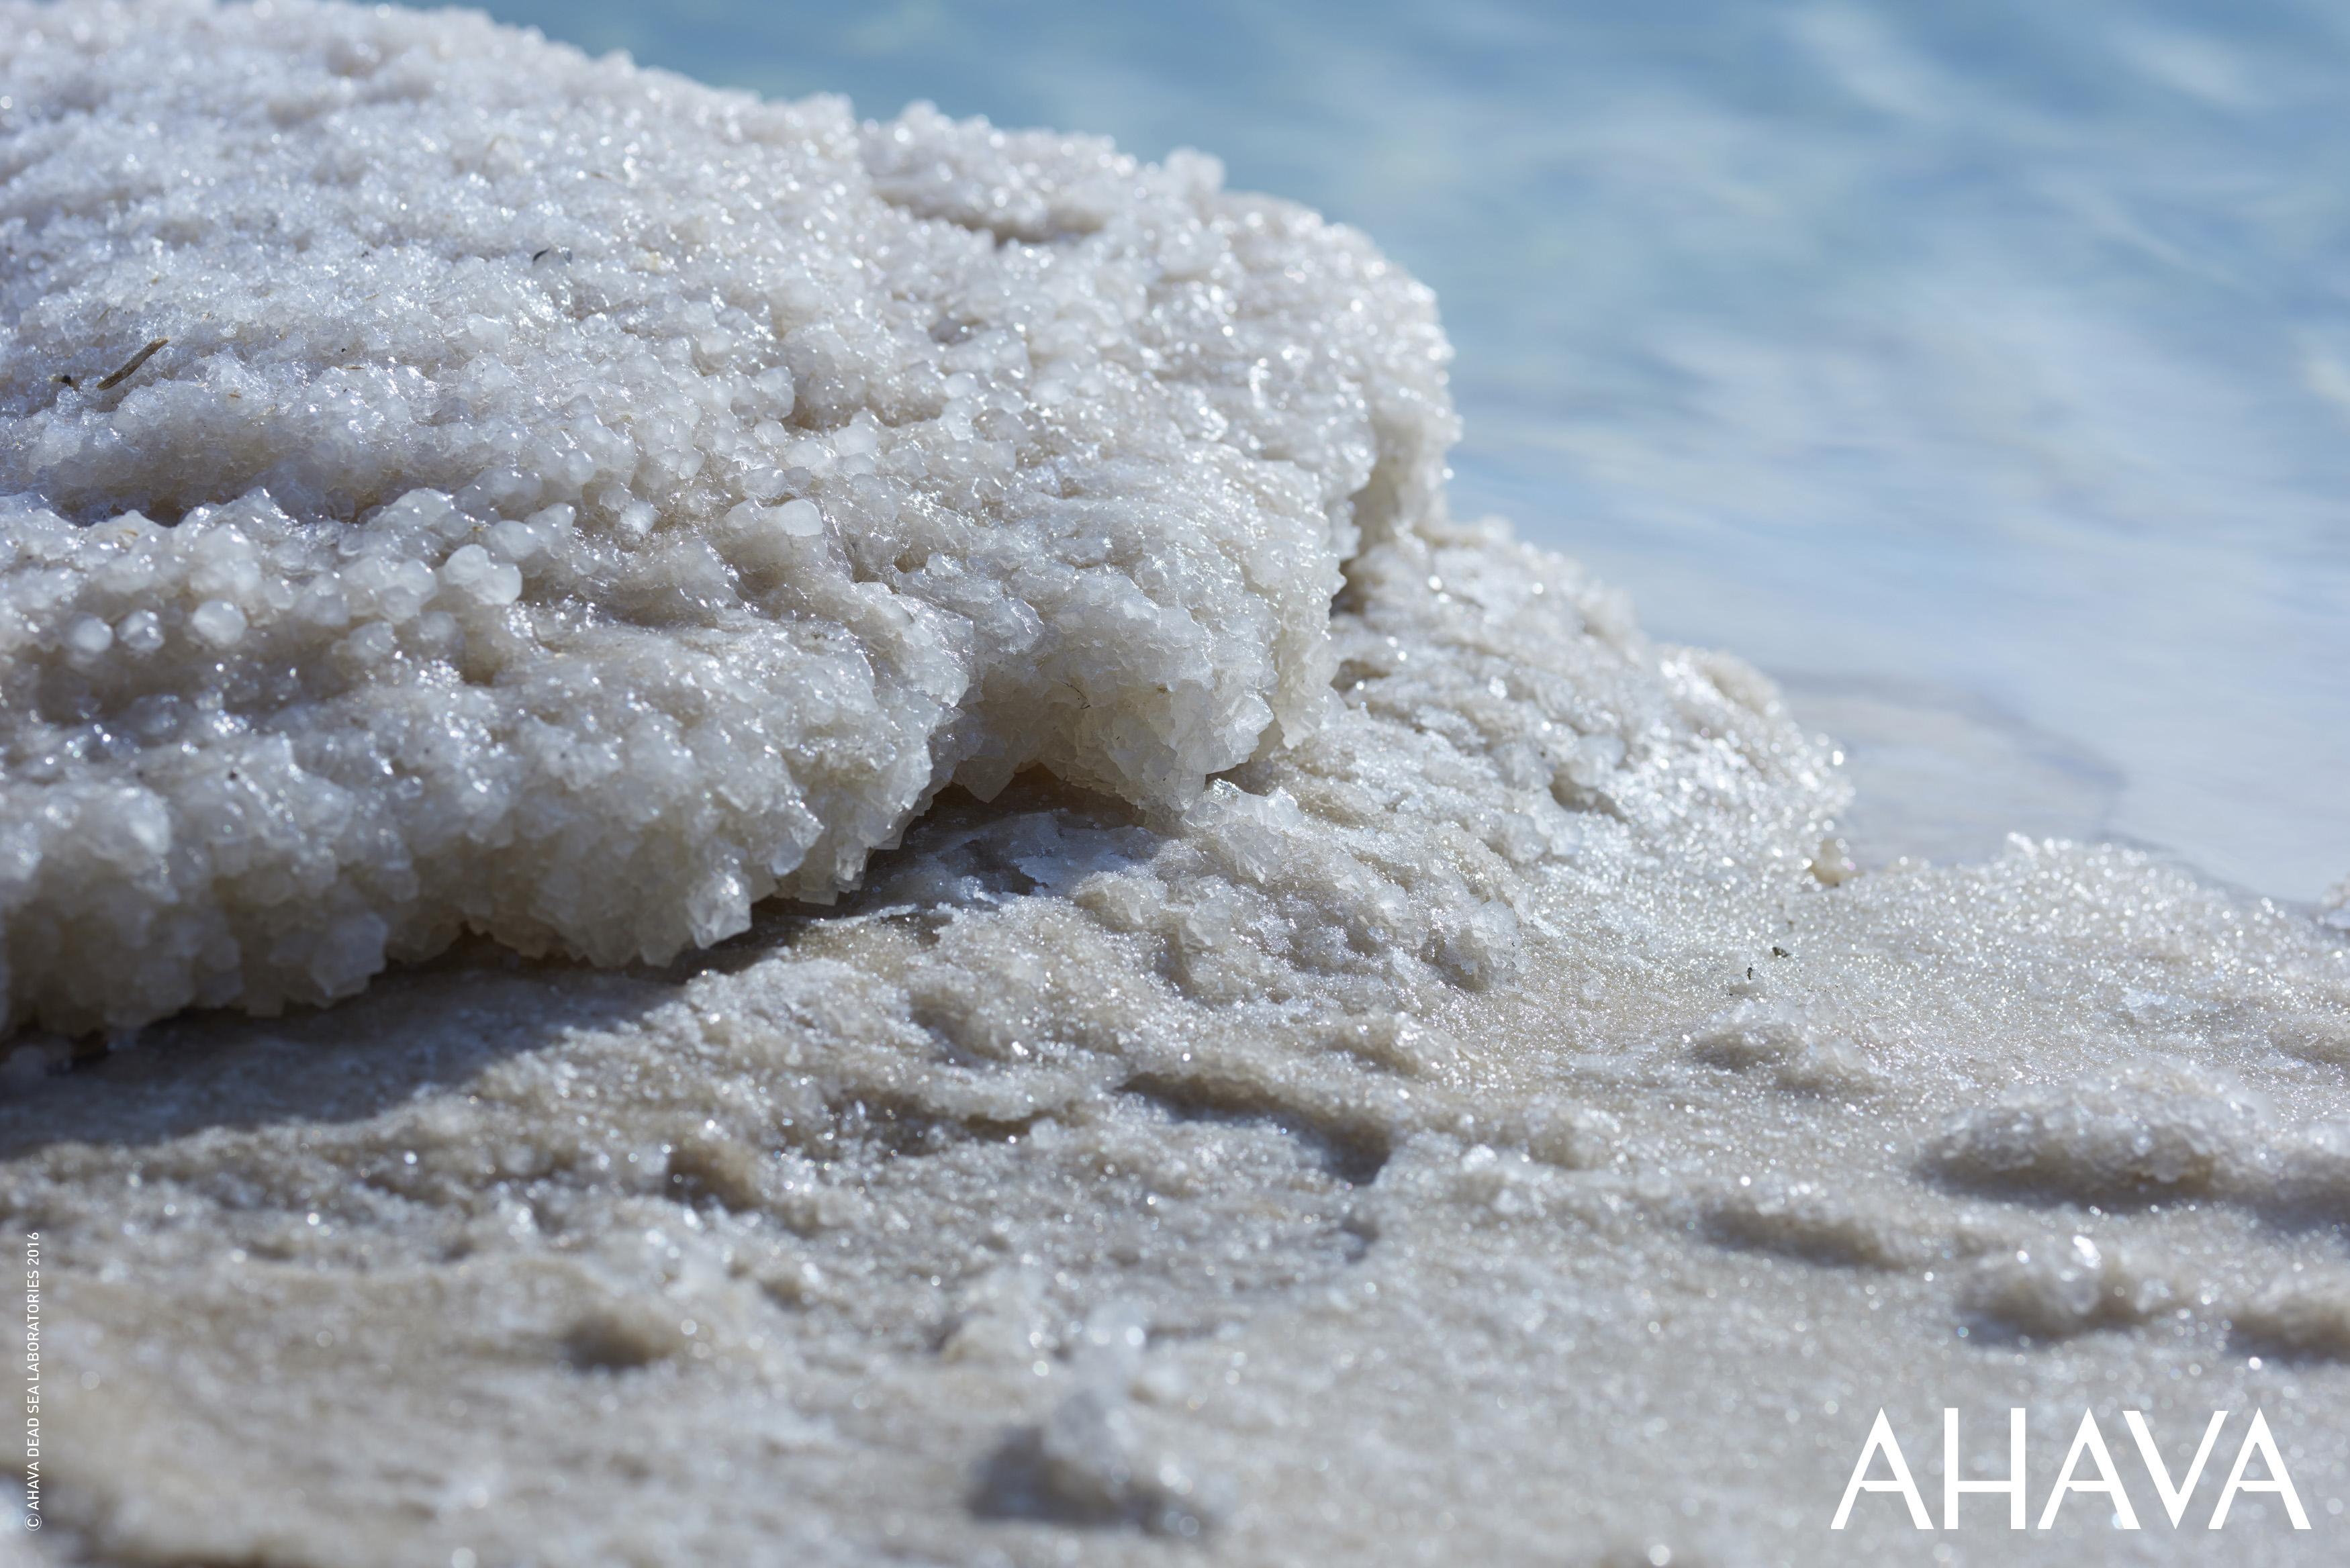 AHAVA Dead Sea Salt Water